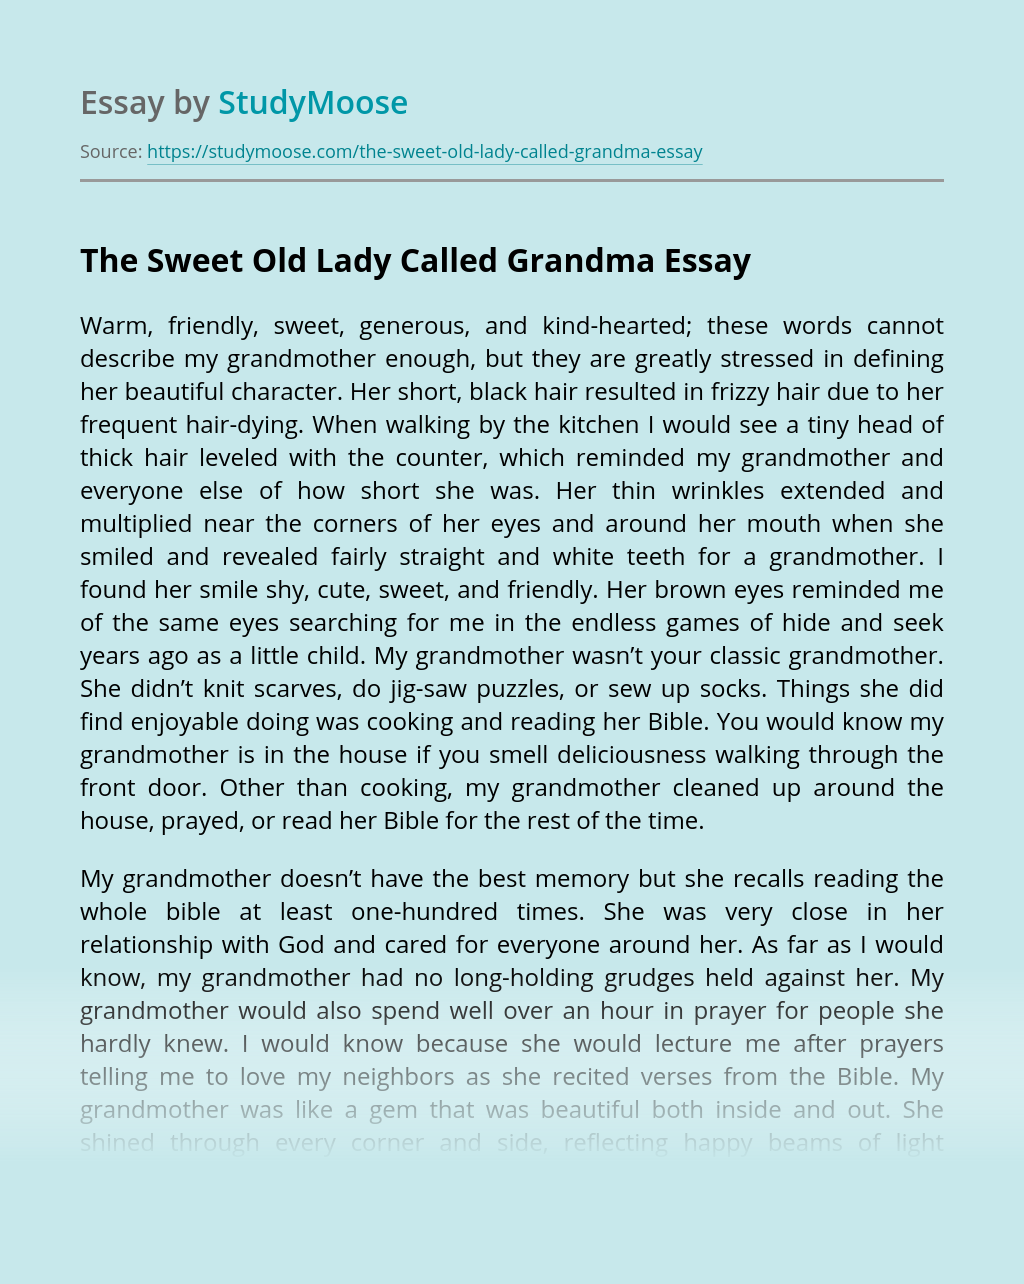 The Sweet Old Lady Called Grandma